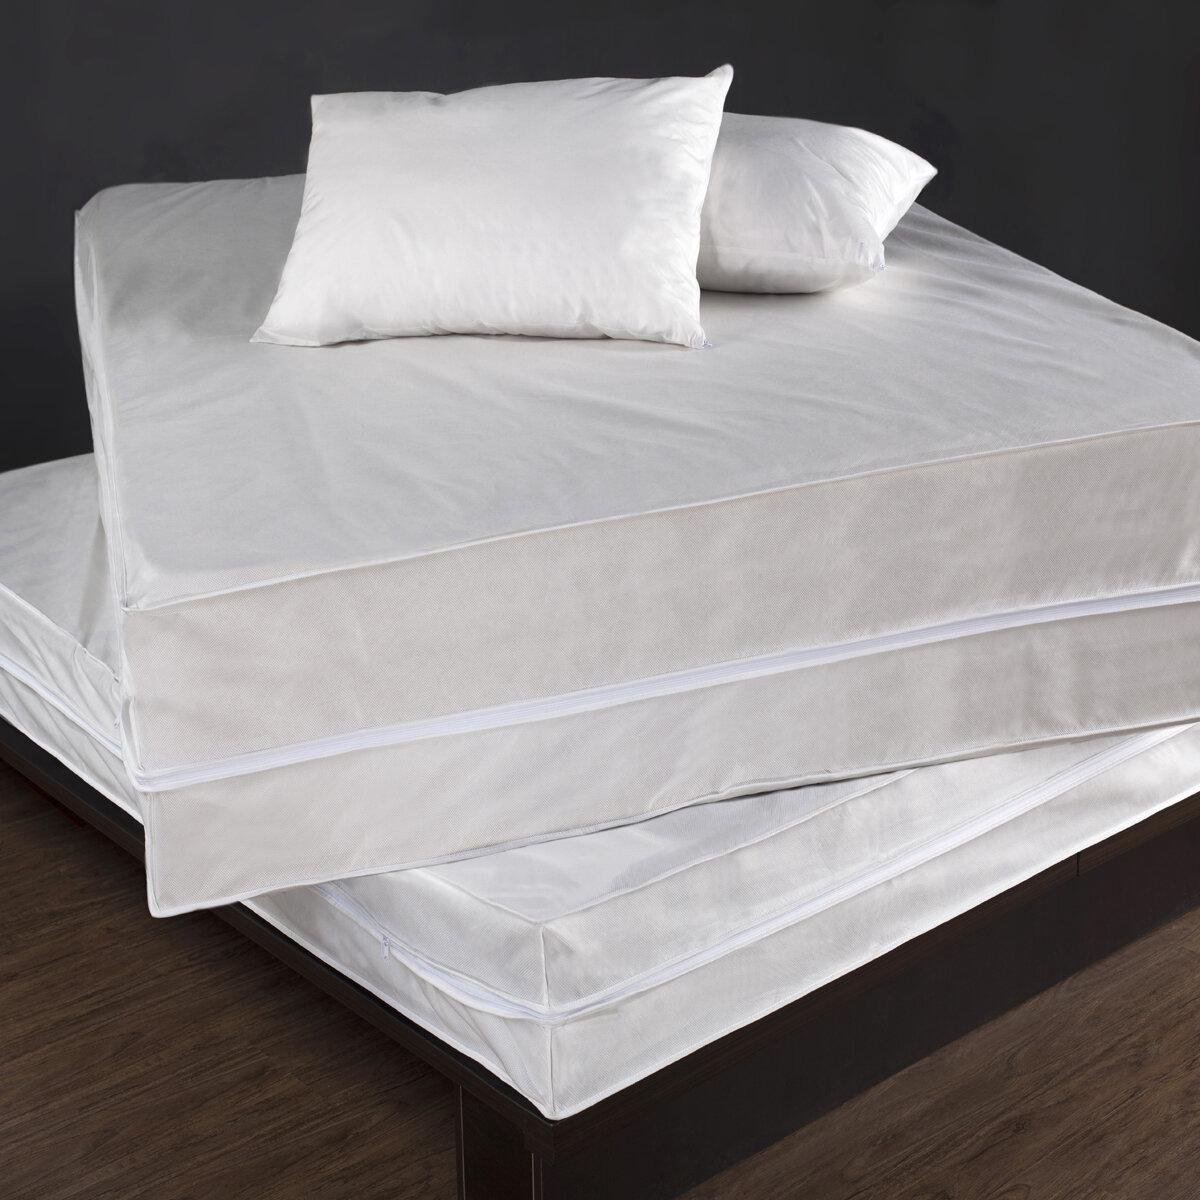 Alwyn Home Bed Bug Amp Dust Mite Control Hypoallergenic